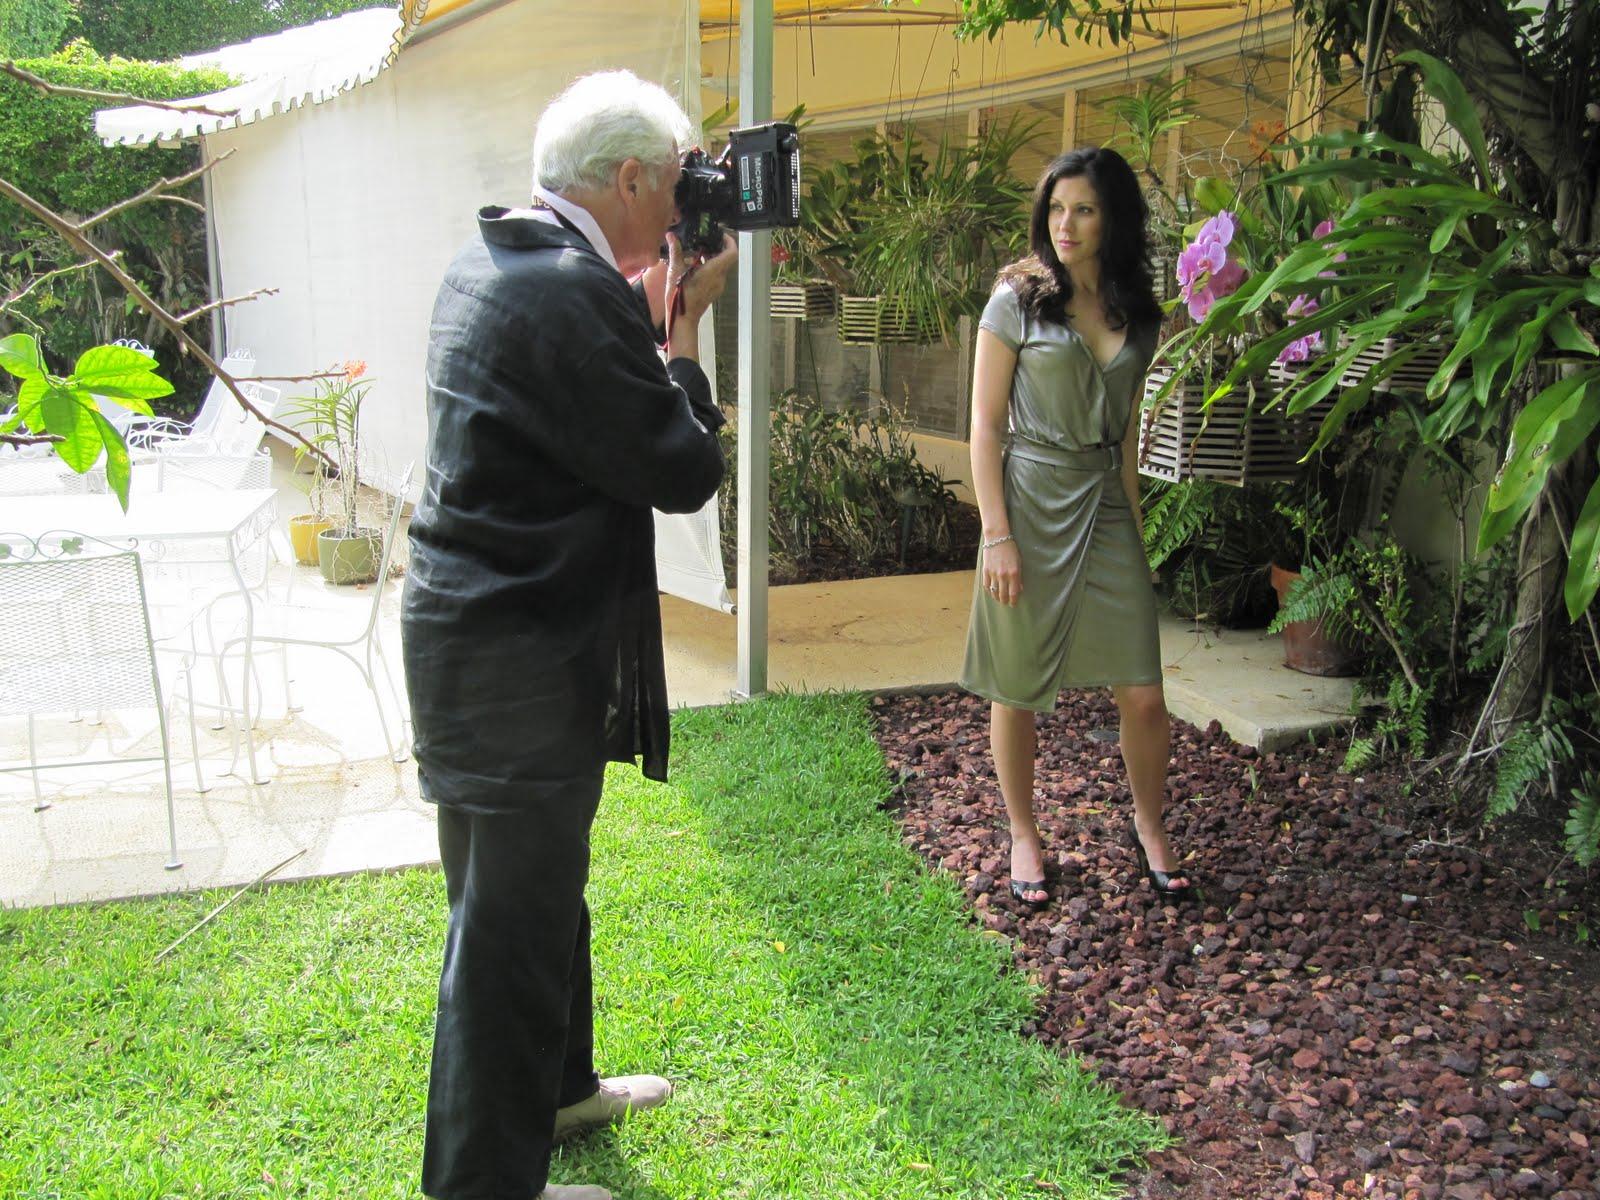 Harry Benson shooting Kathryn Weisbeck